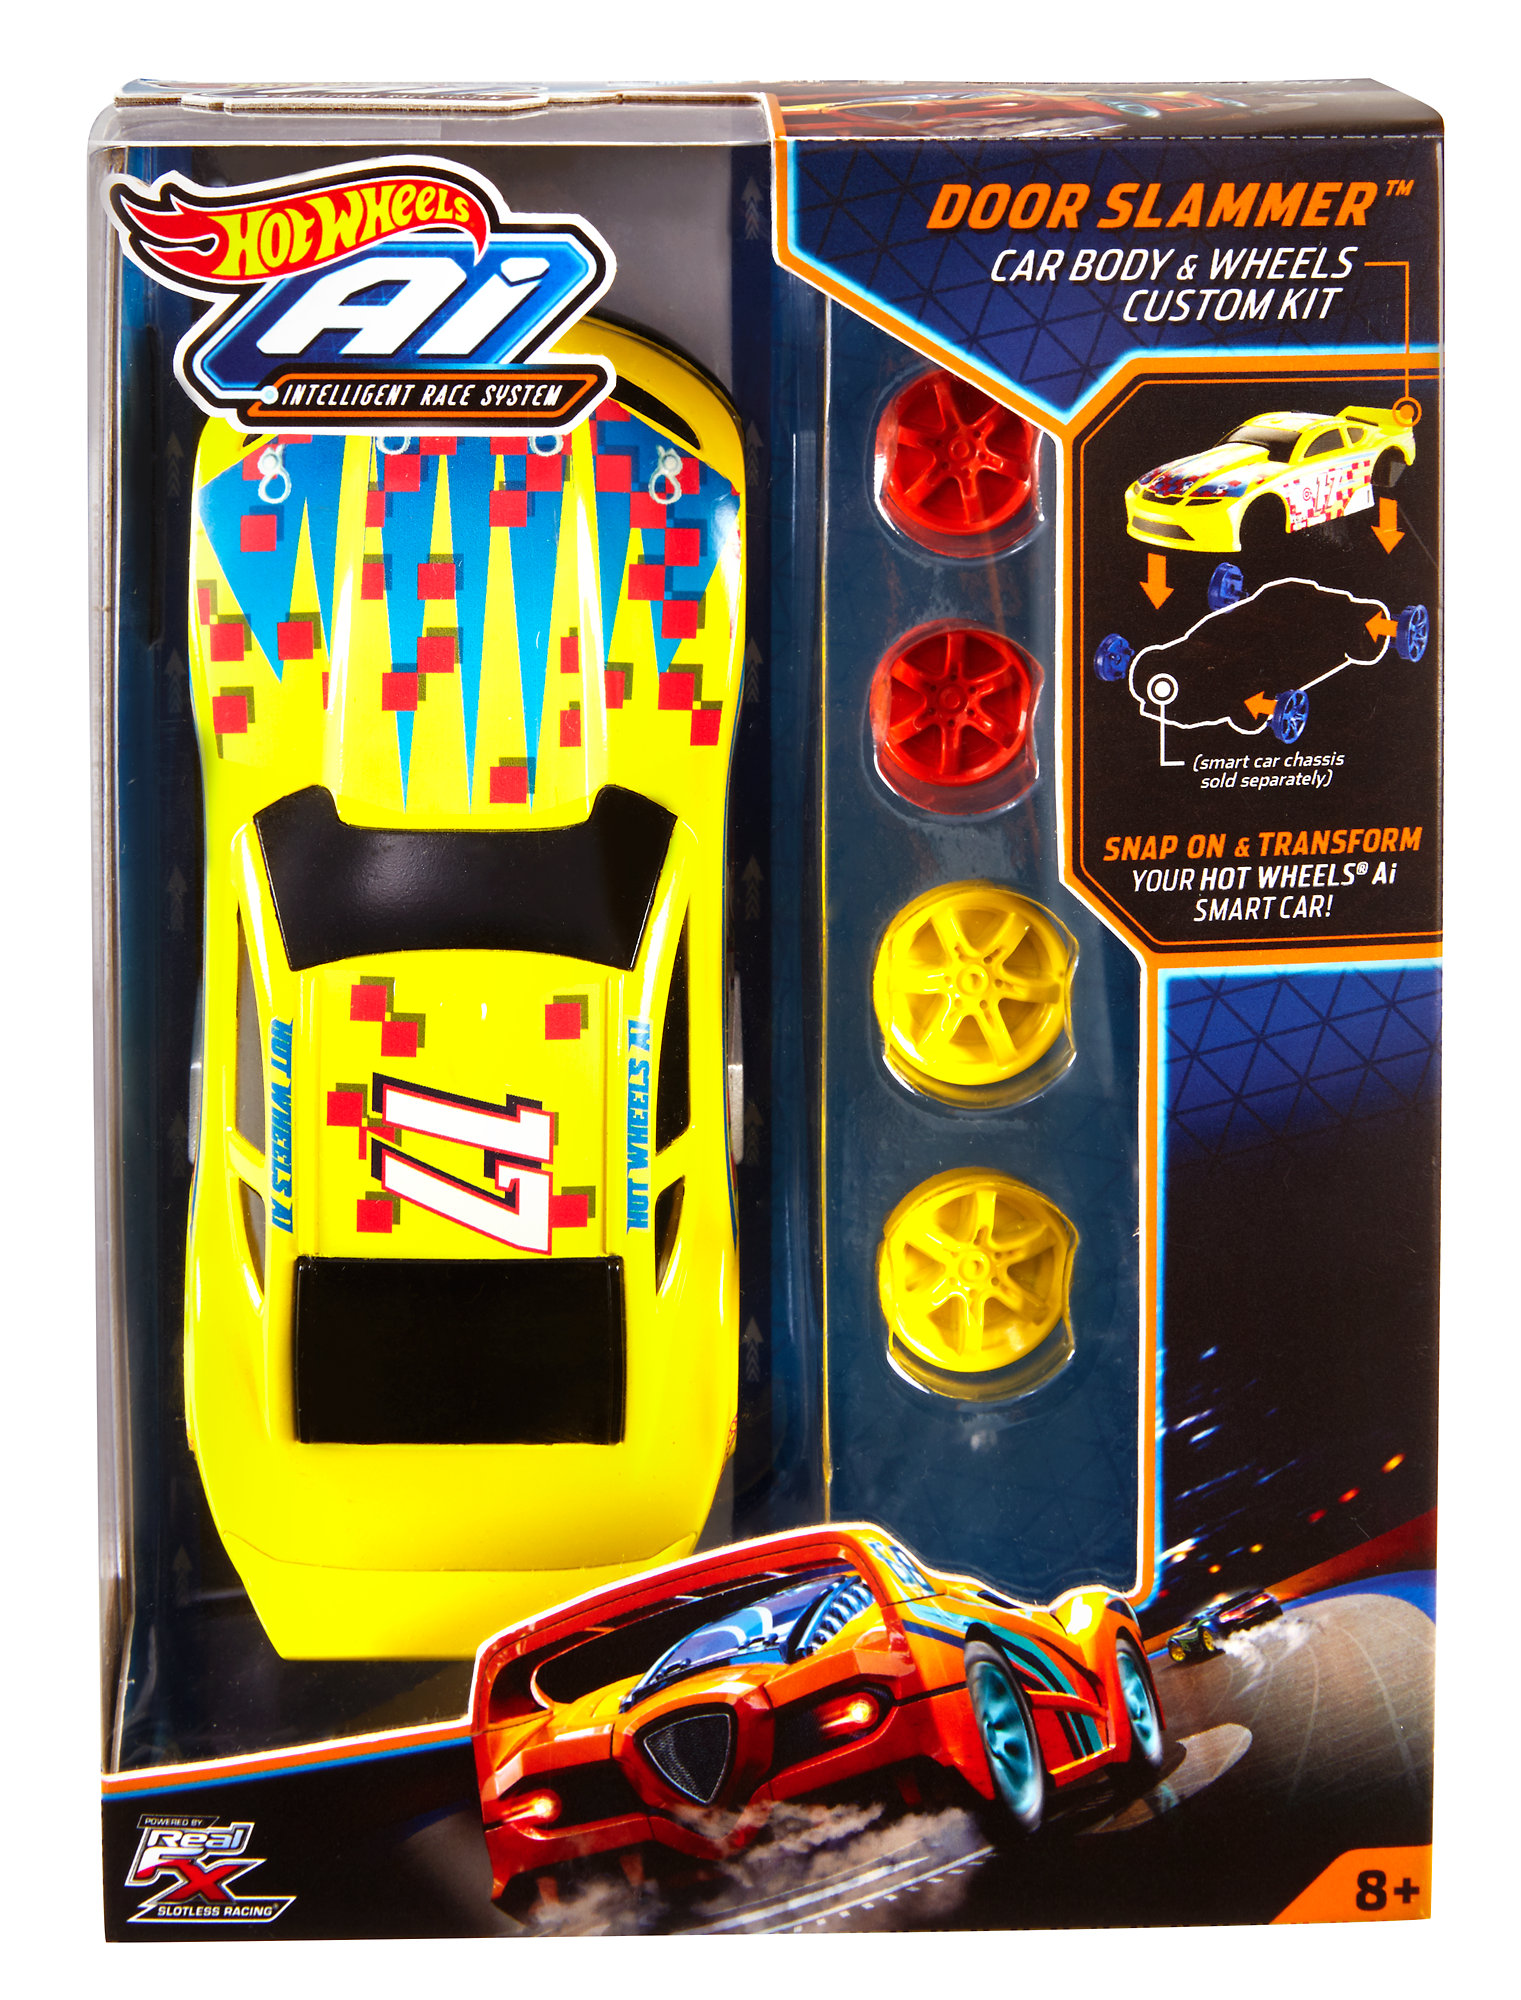 Hot Wheels AI Door Slammer Car Body & Wheels Custom Kit by Mattel